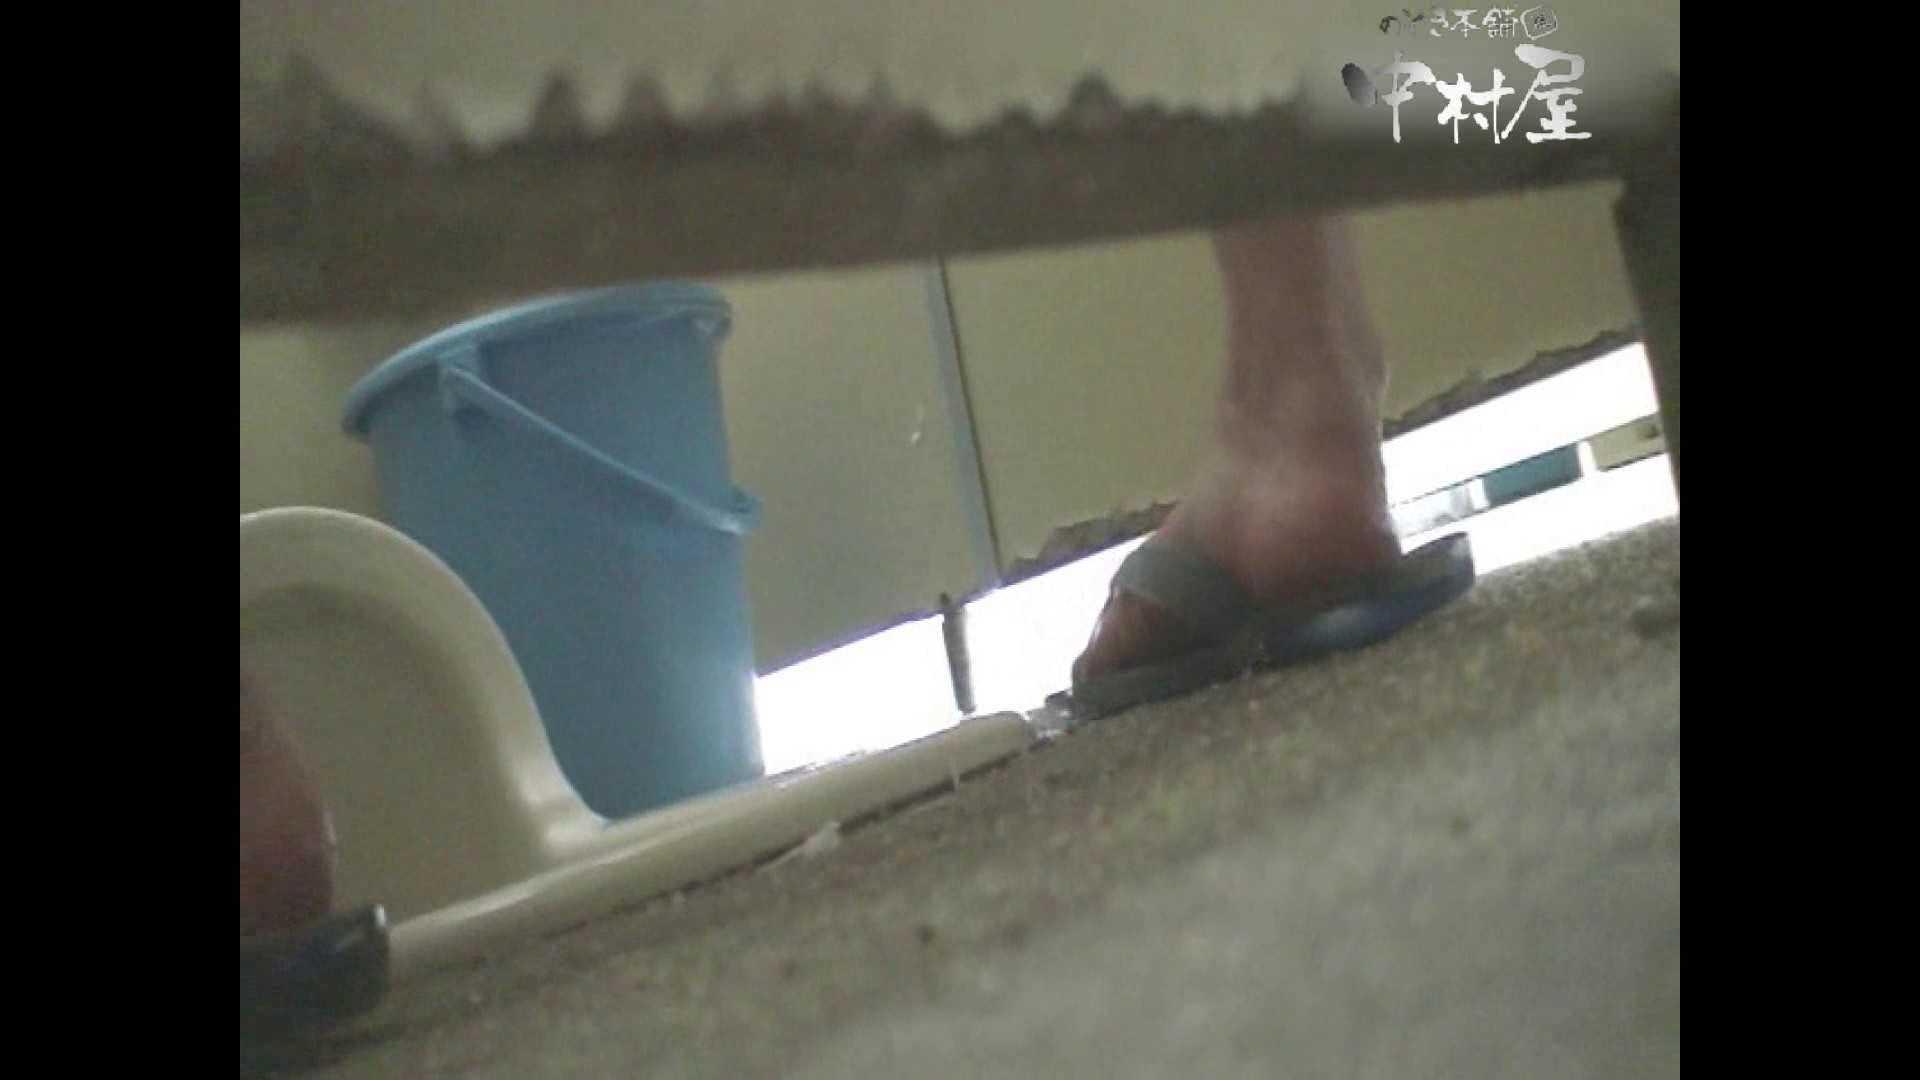 岩手県在住盗撮師盗撮記録vol.18 盗撮シリーズ ぱこり動画紹介 98PIX 7